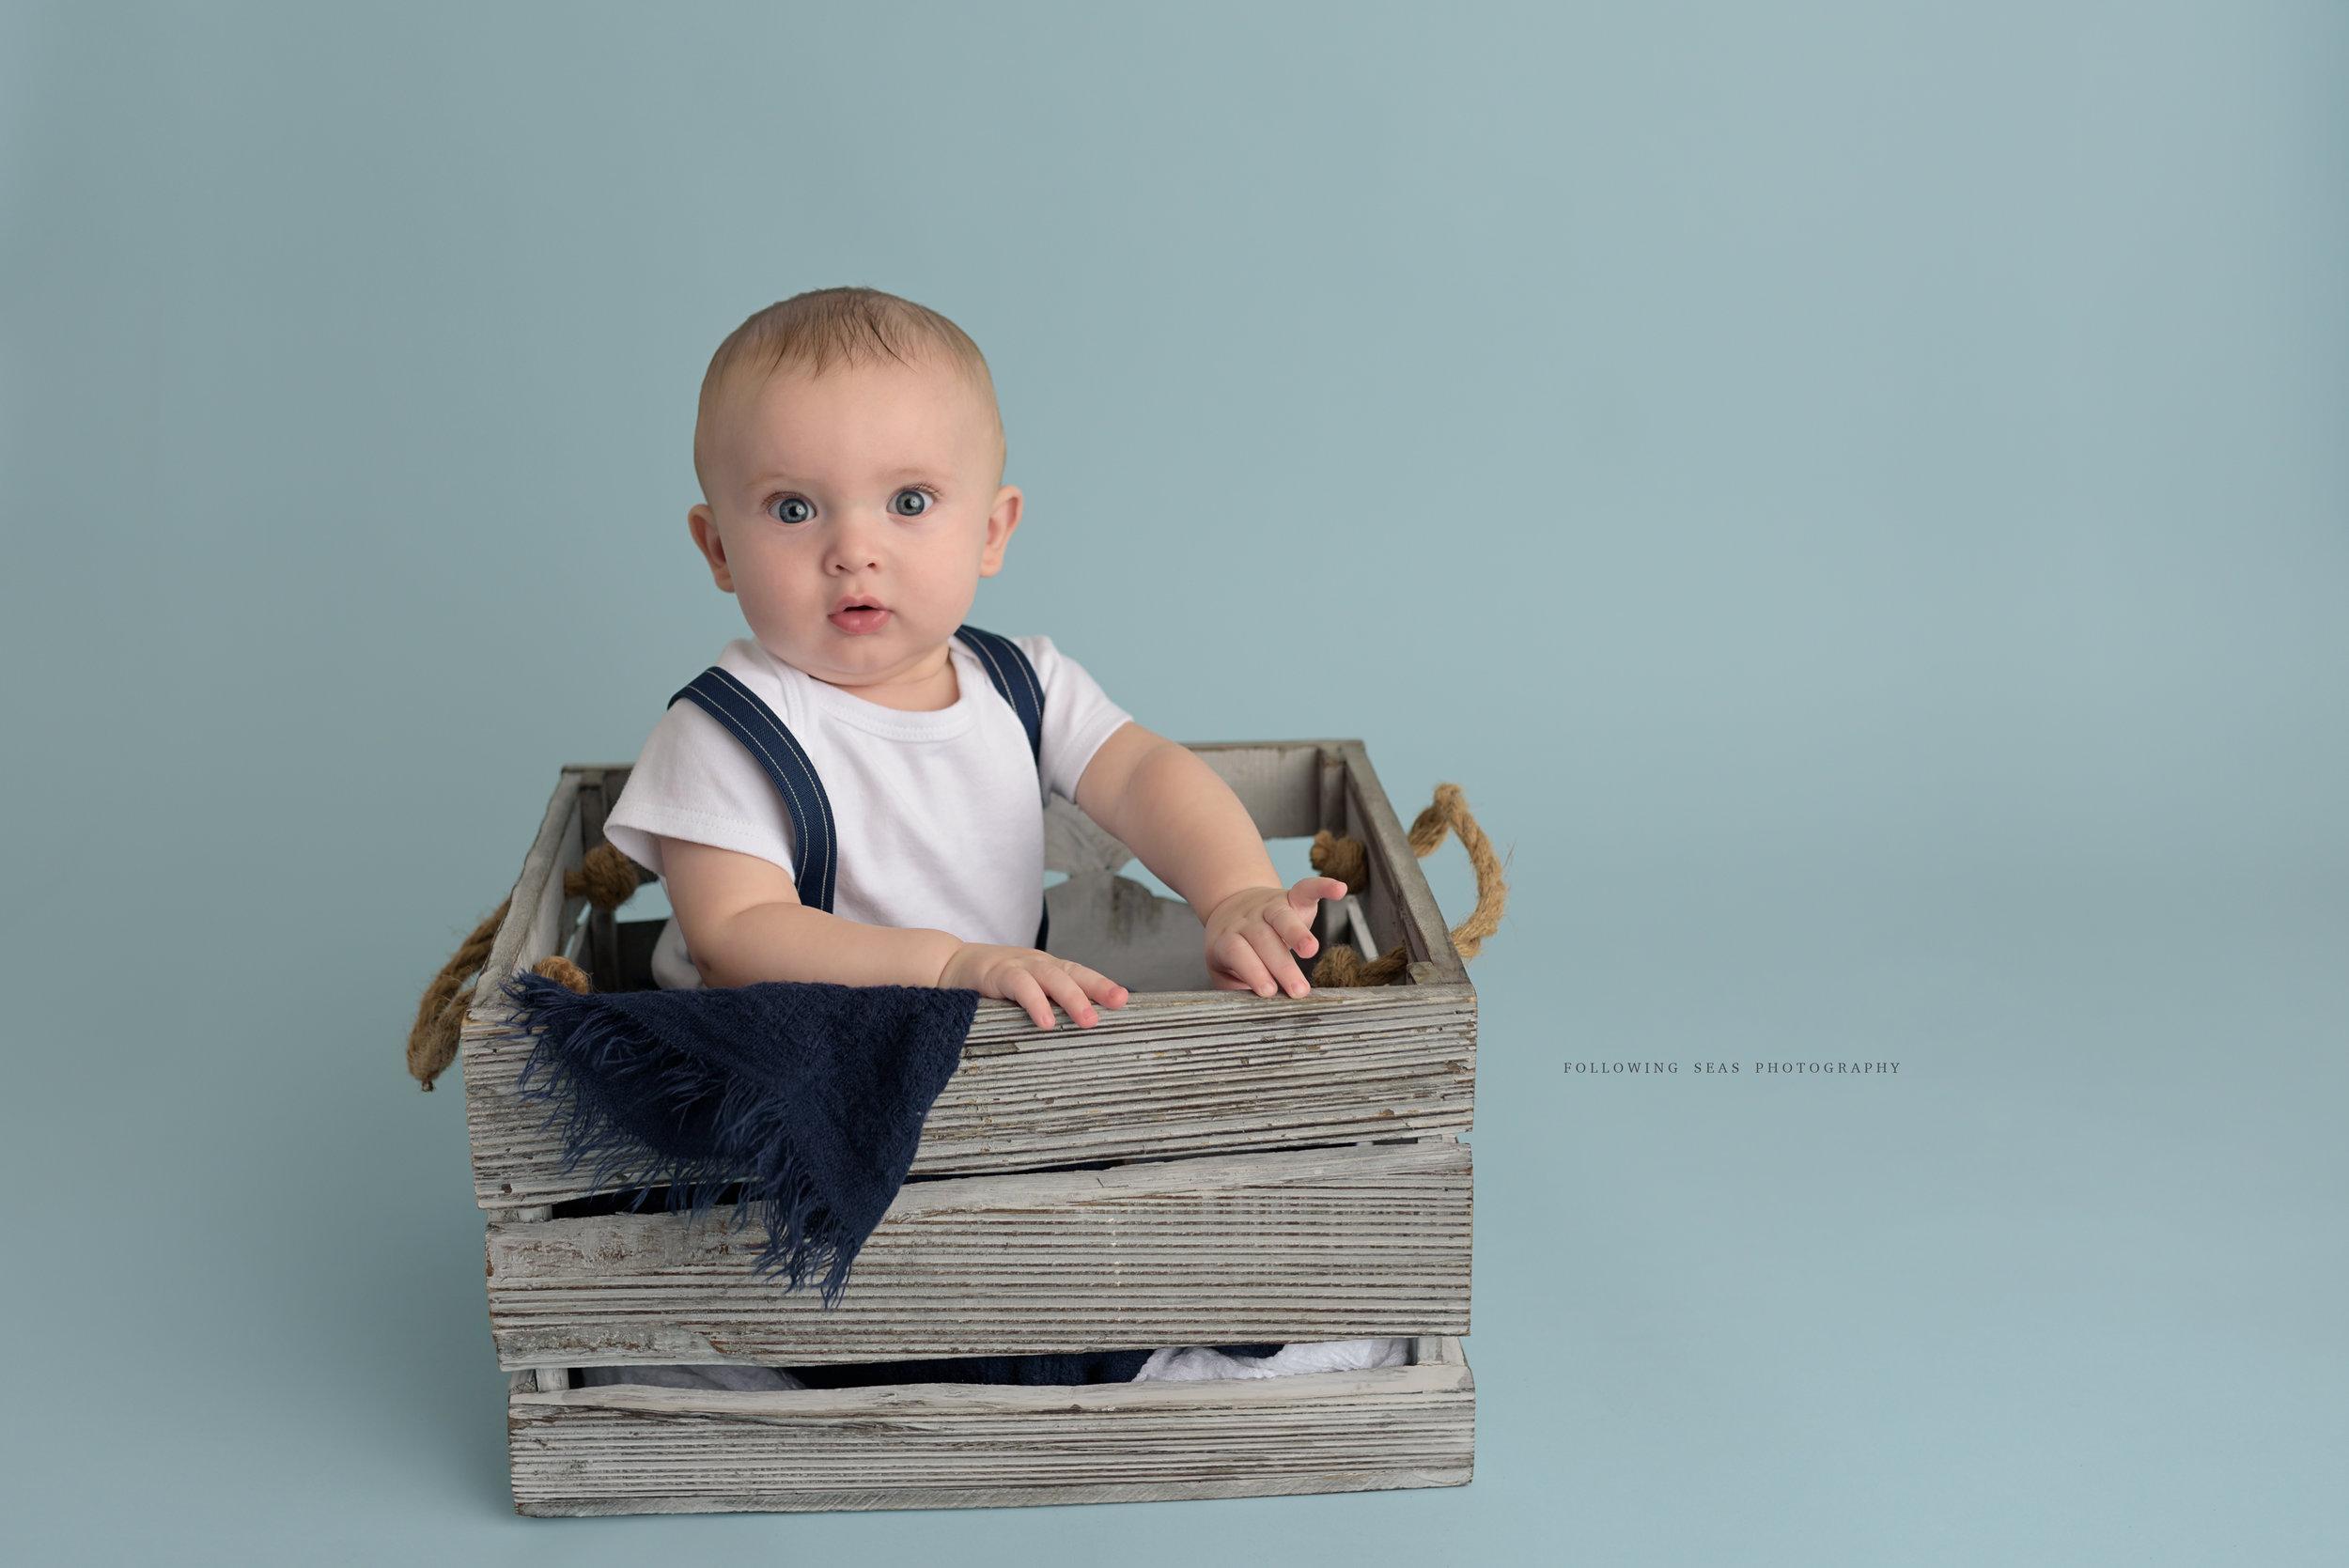 Charleston-Family-Photographer-Following-Seas-Photography-4670.jpg